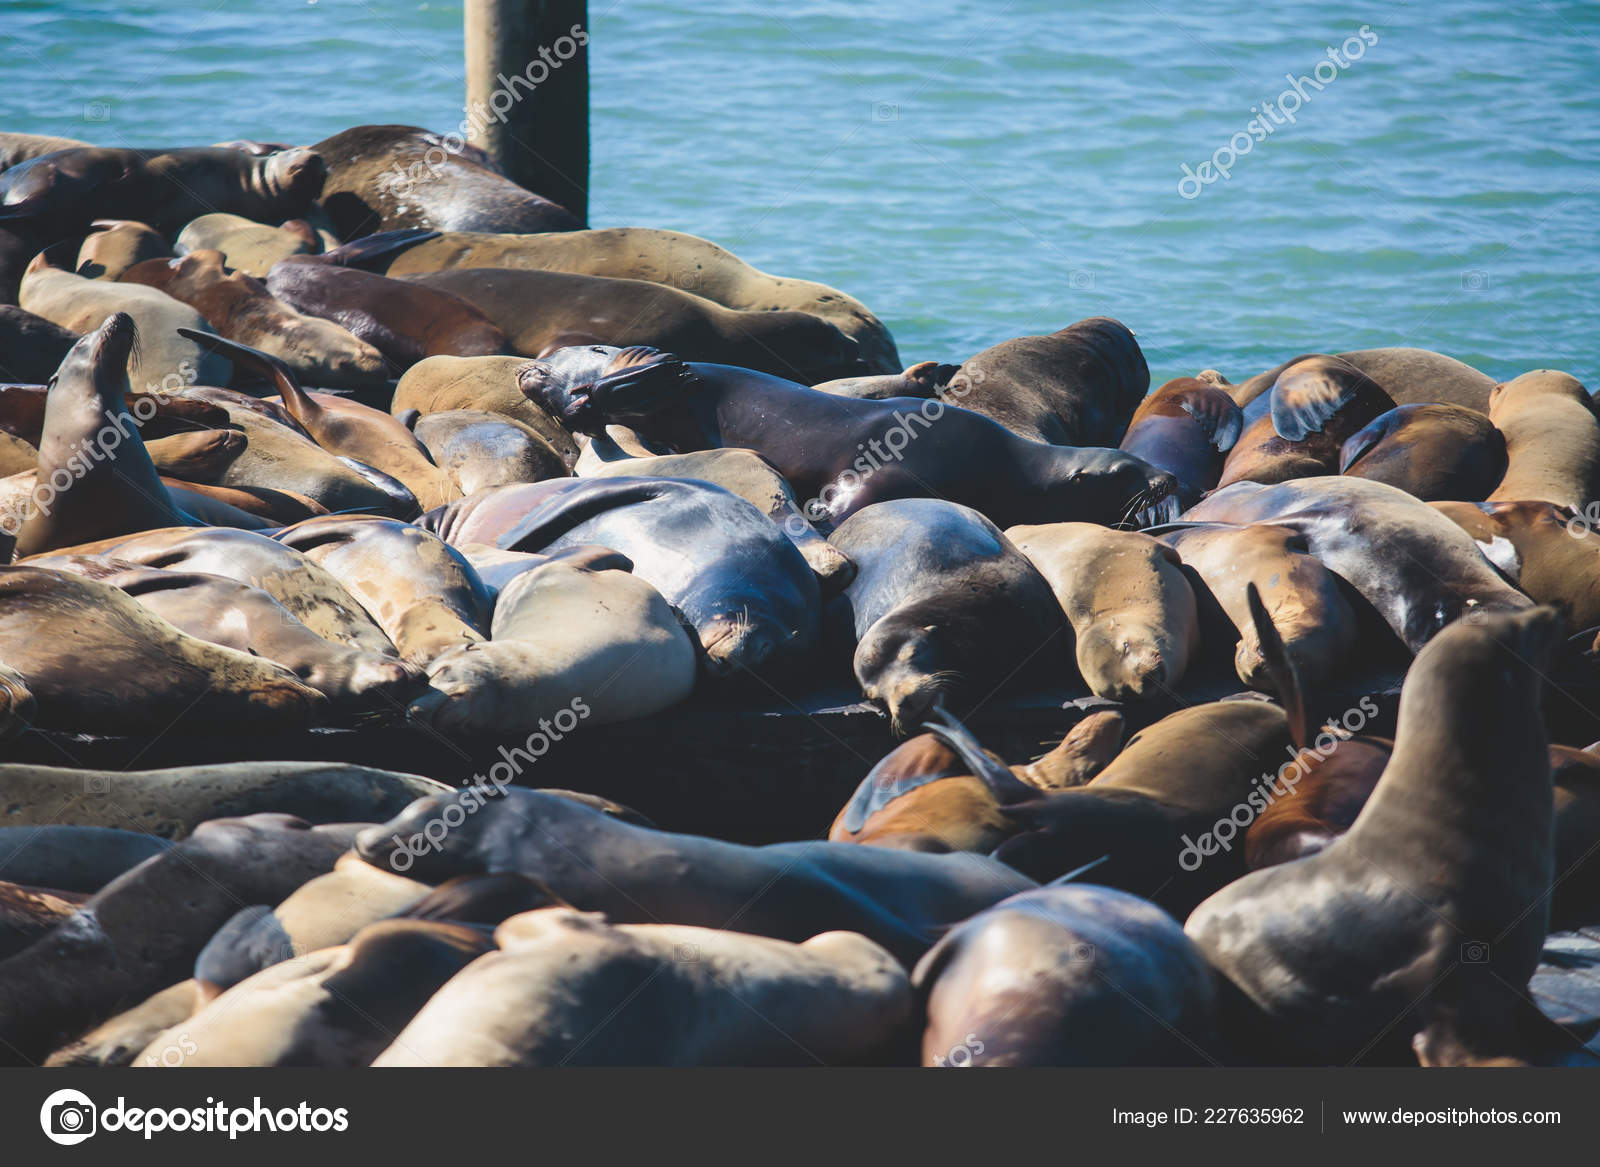 View Pier Seals Sea Lions Wooden Platforms Fisherman Wharf San Stock Photo C Tsuguliev 227635962